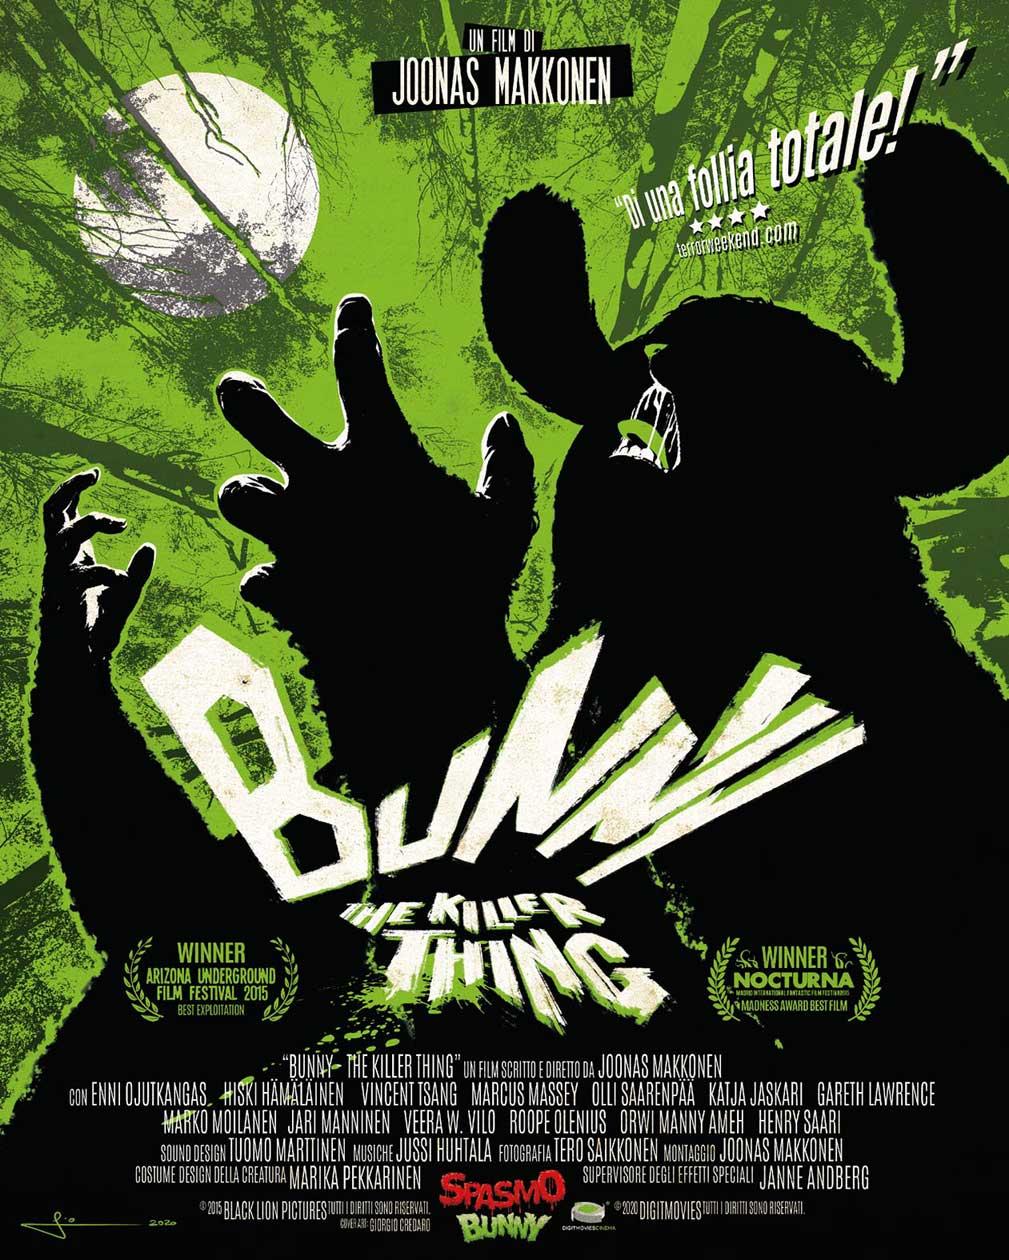 BUNNY THE KILLER THING - BLU RAY